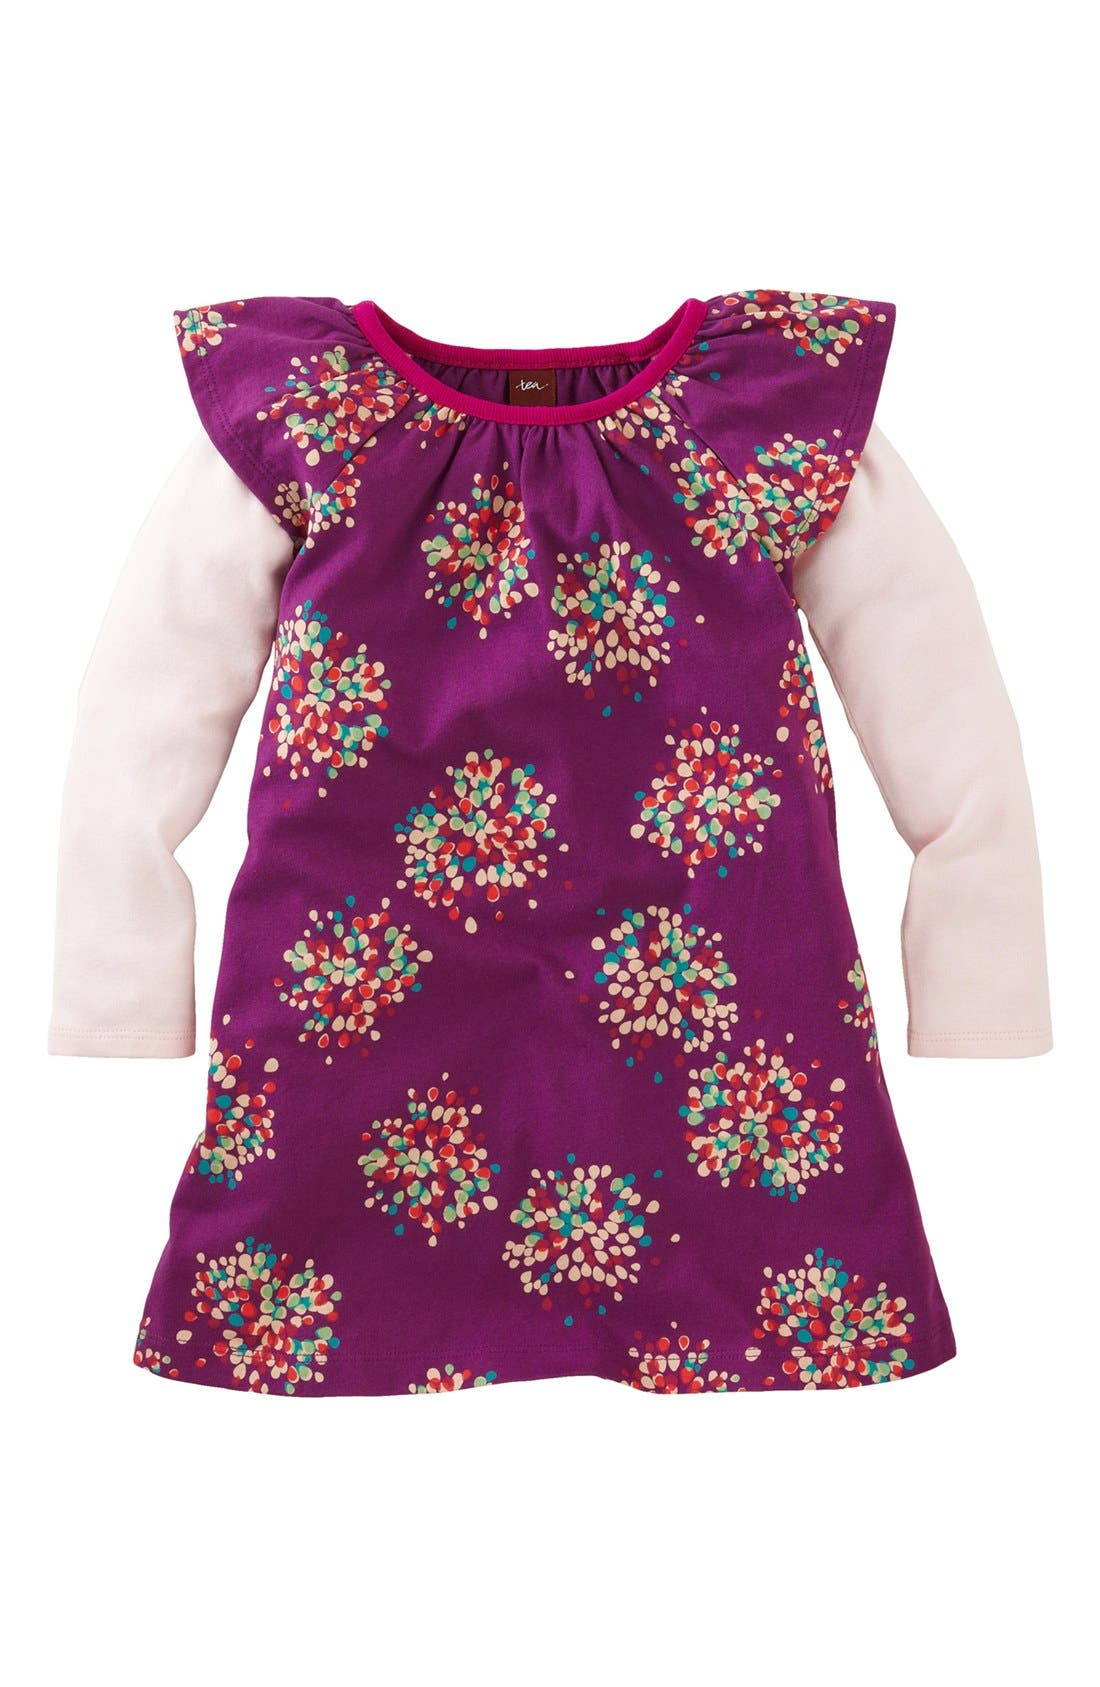 Main Image - Tea Collection 'Celebration' Dress (Baby Girls)